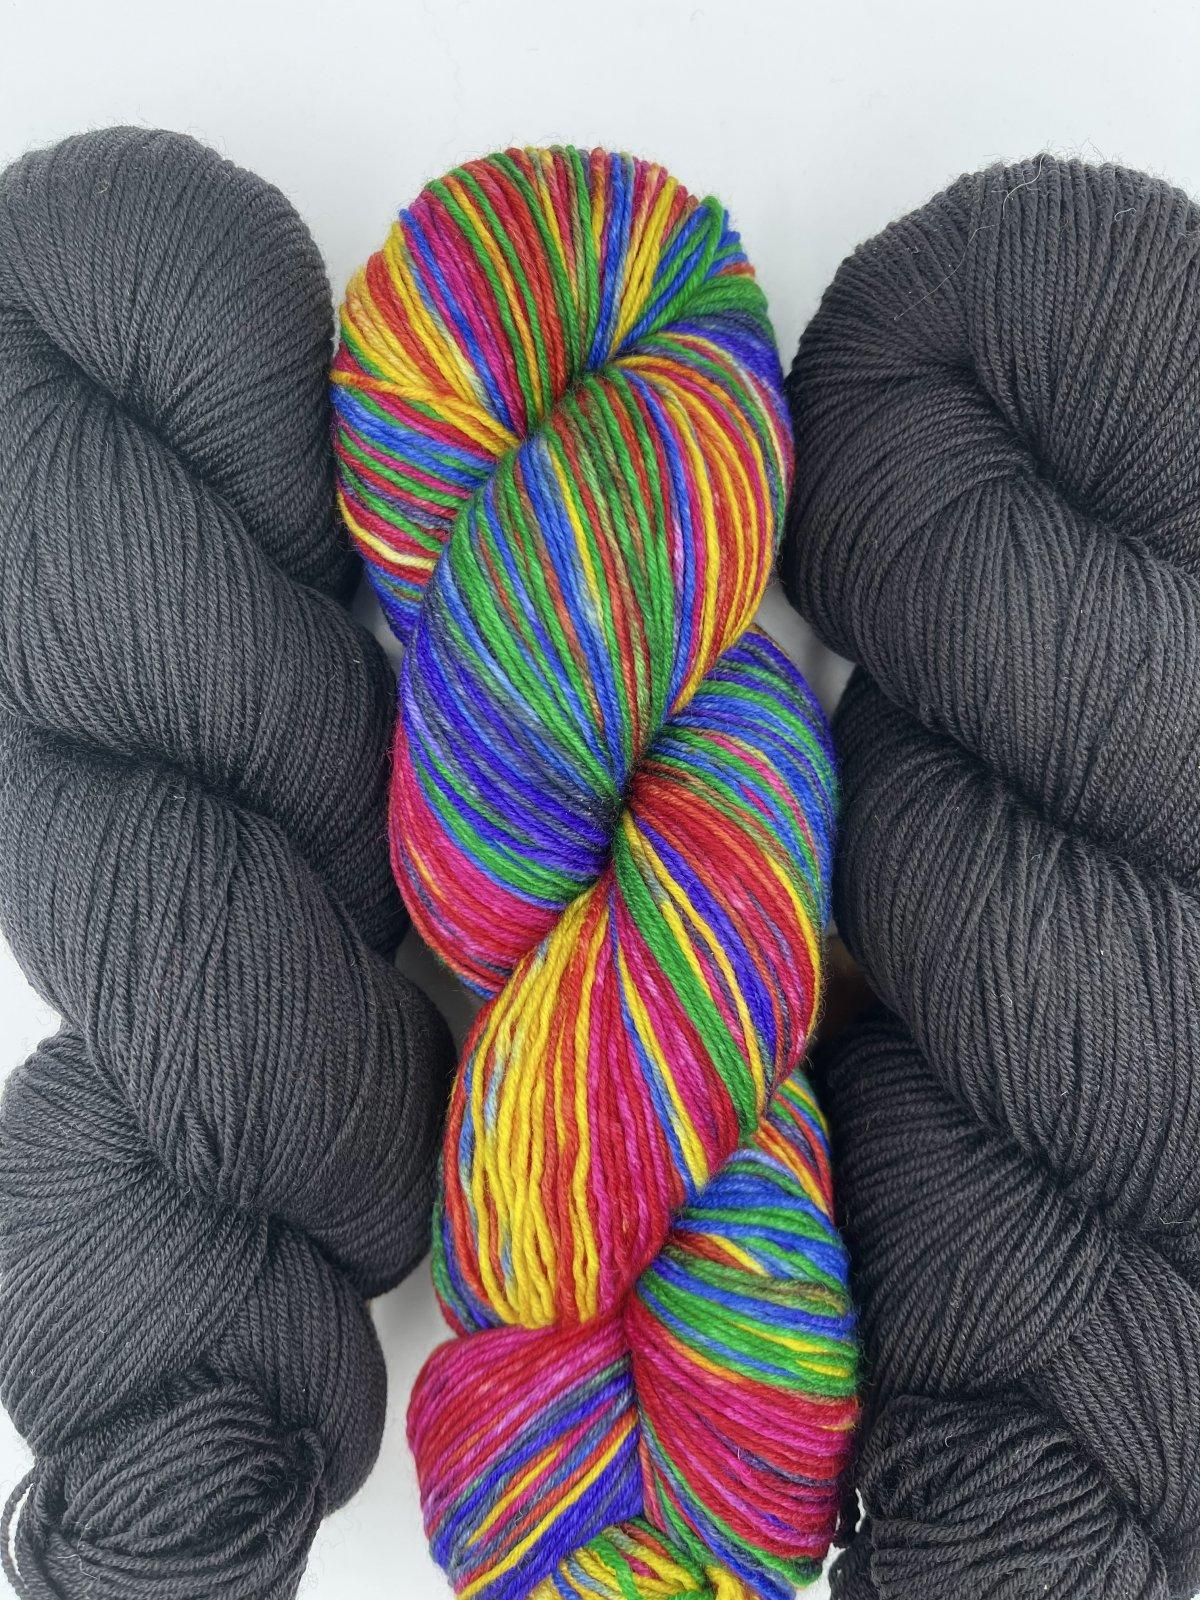 Endless Rainbow Kit - Designer Martina Behm